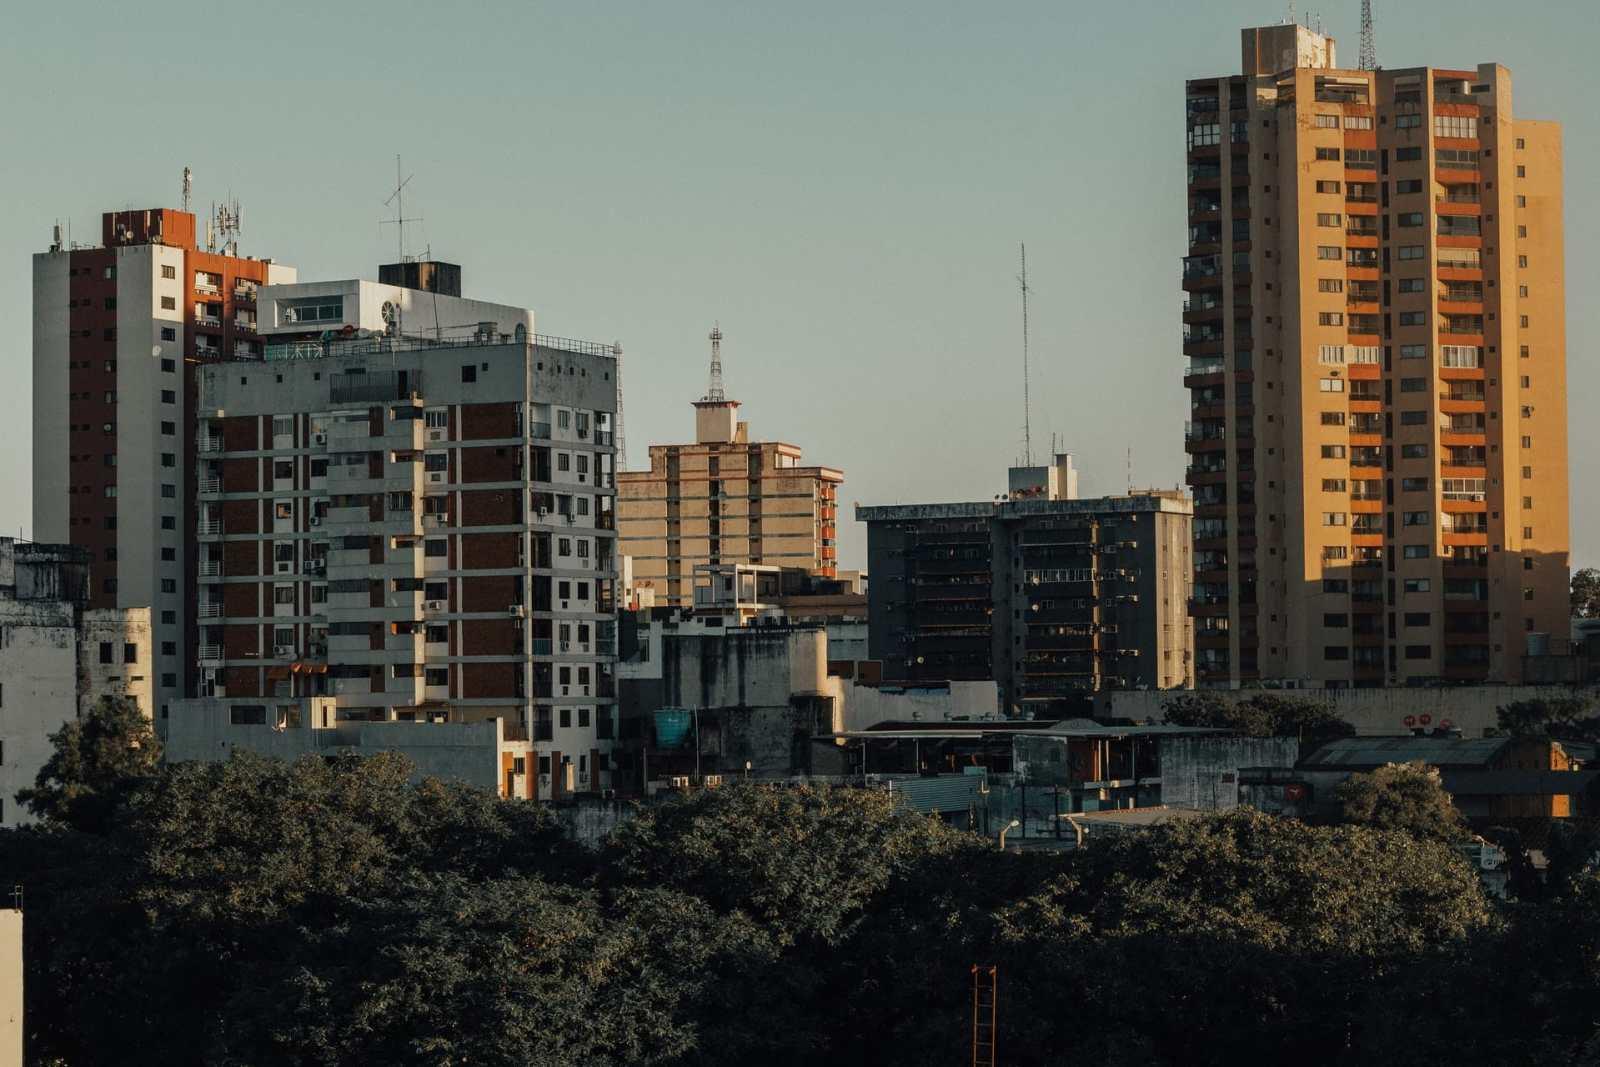 The Best Areas to Stay in Ciudad del Este, Paraguay